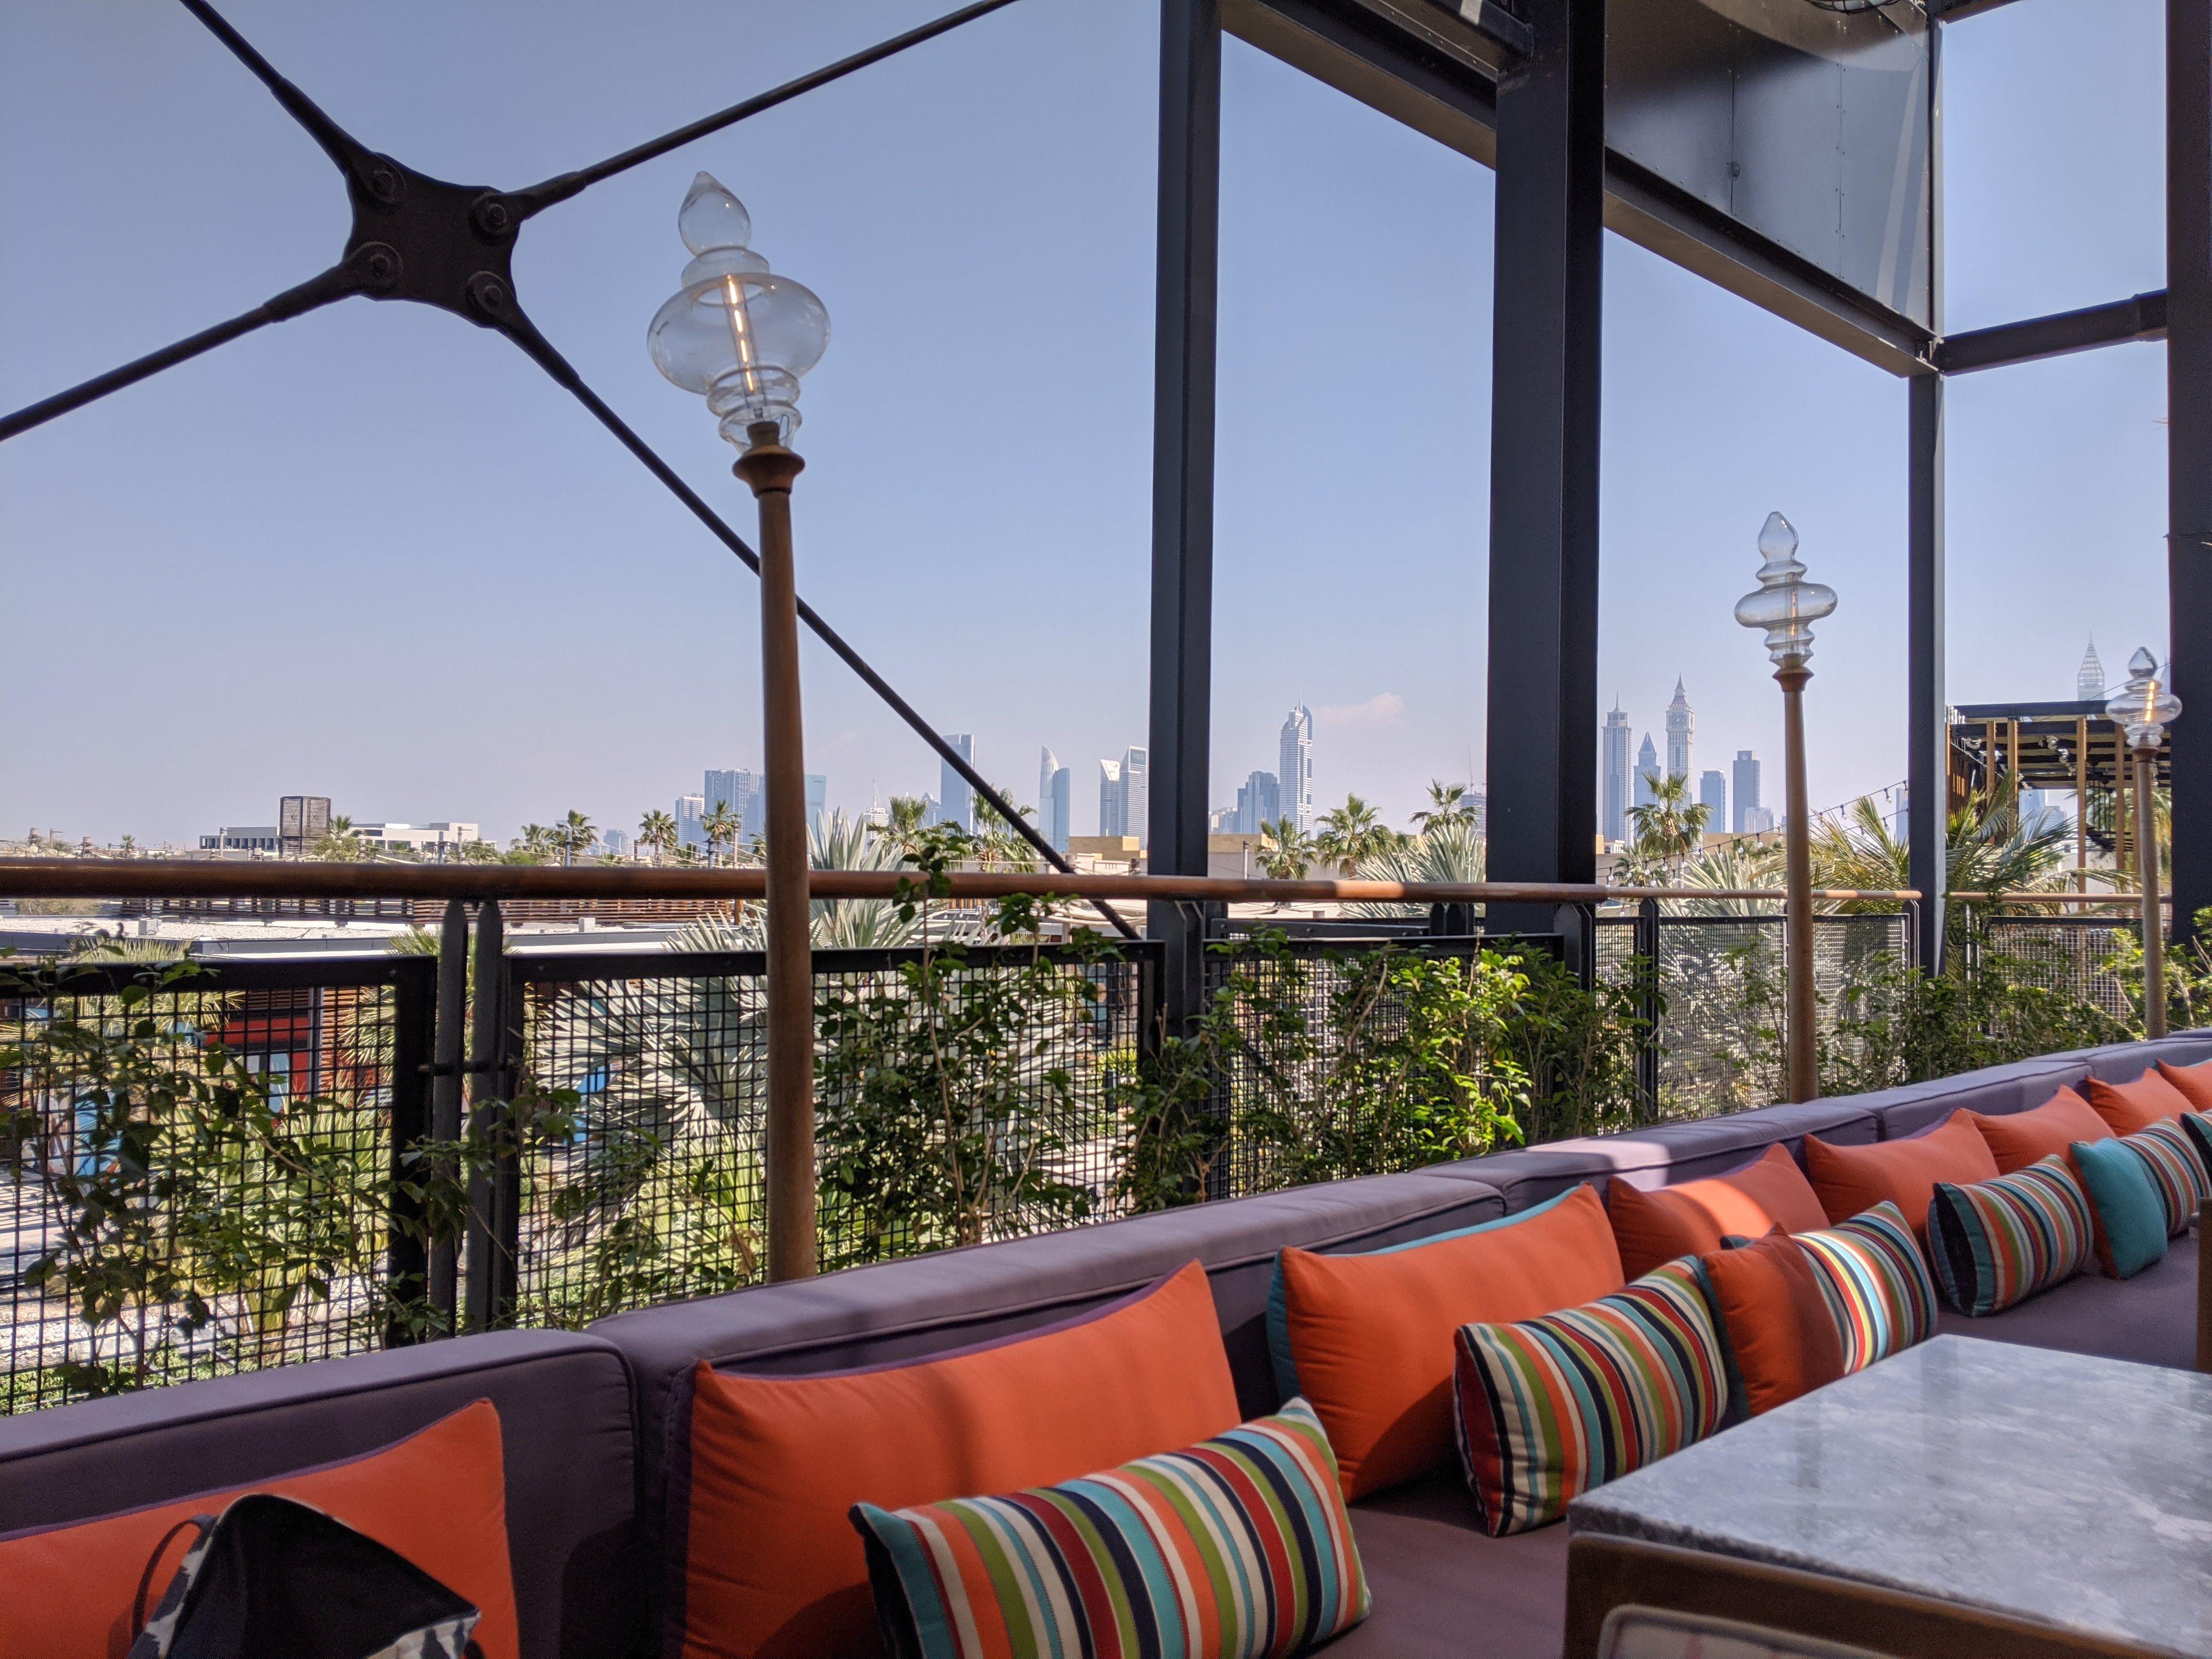 The Top 12 Restaurants in Dubai